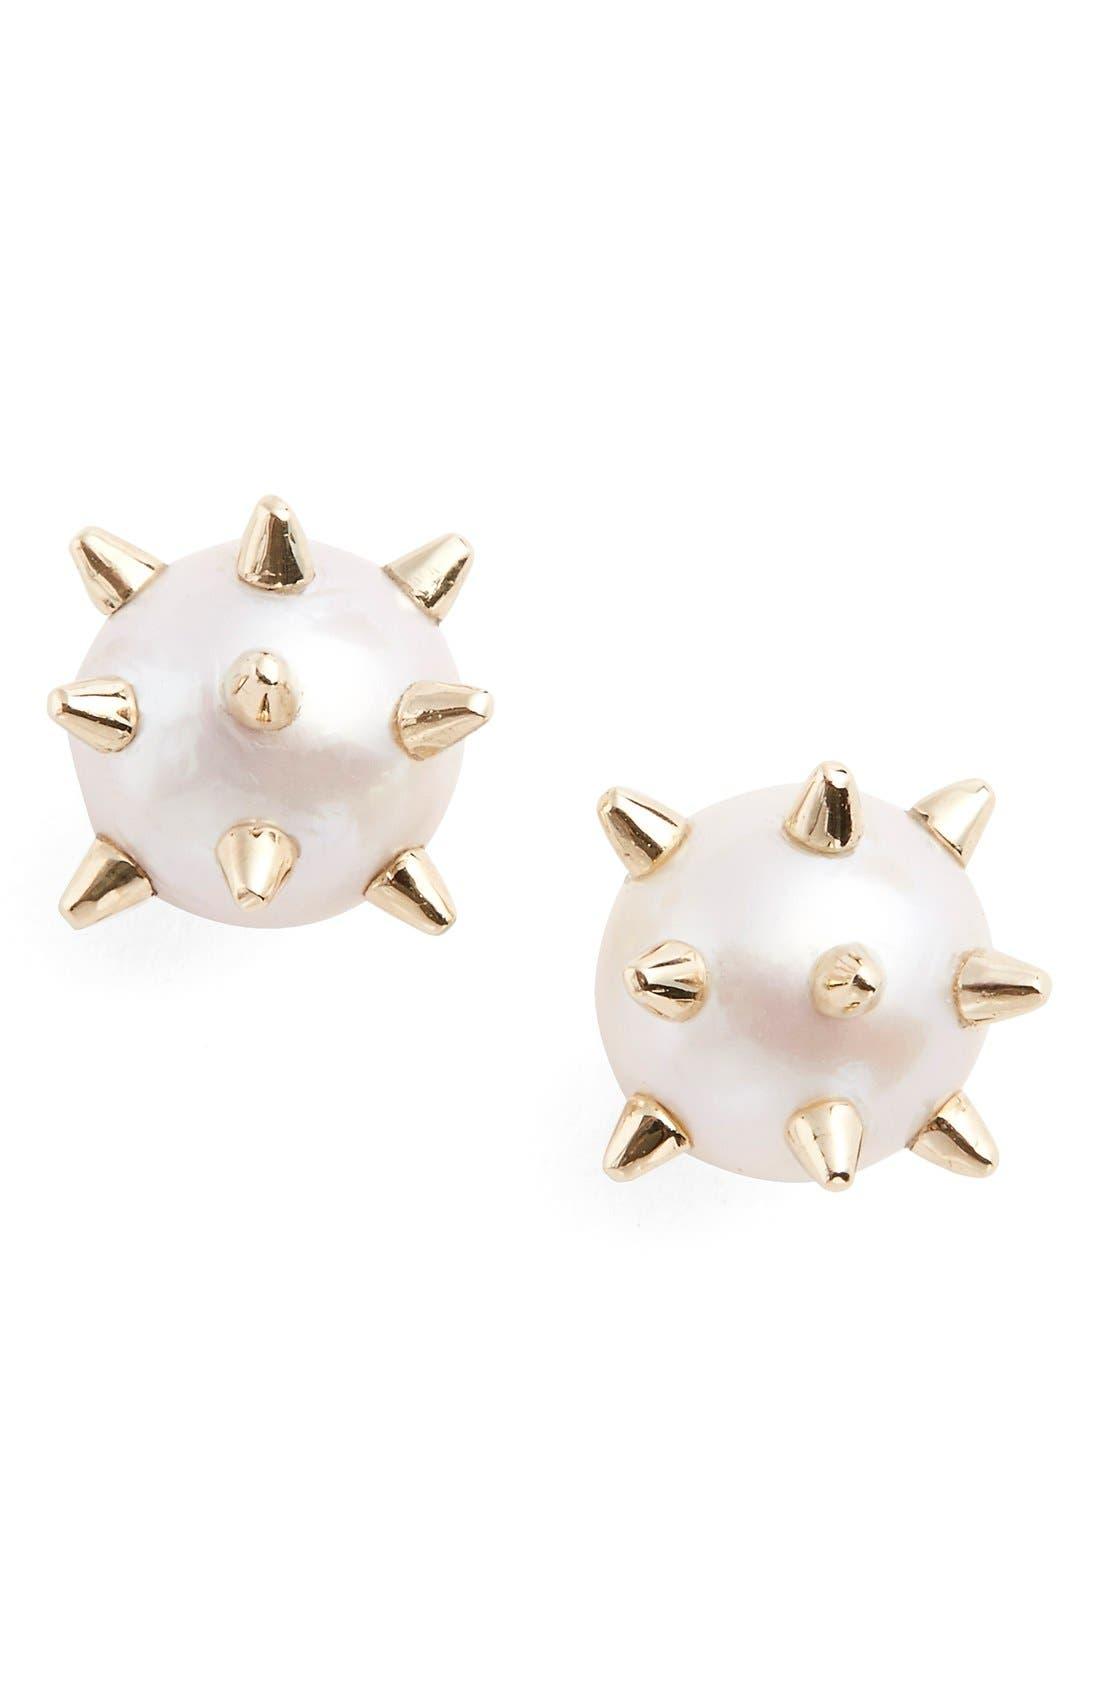 Main Image - Nektar de Stagni 'New Classics' Spike Cultured Pearl Earrings